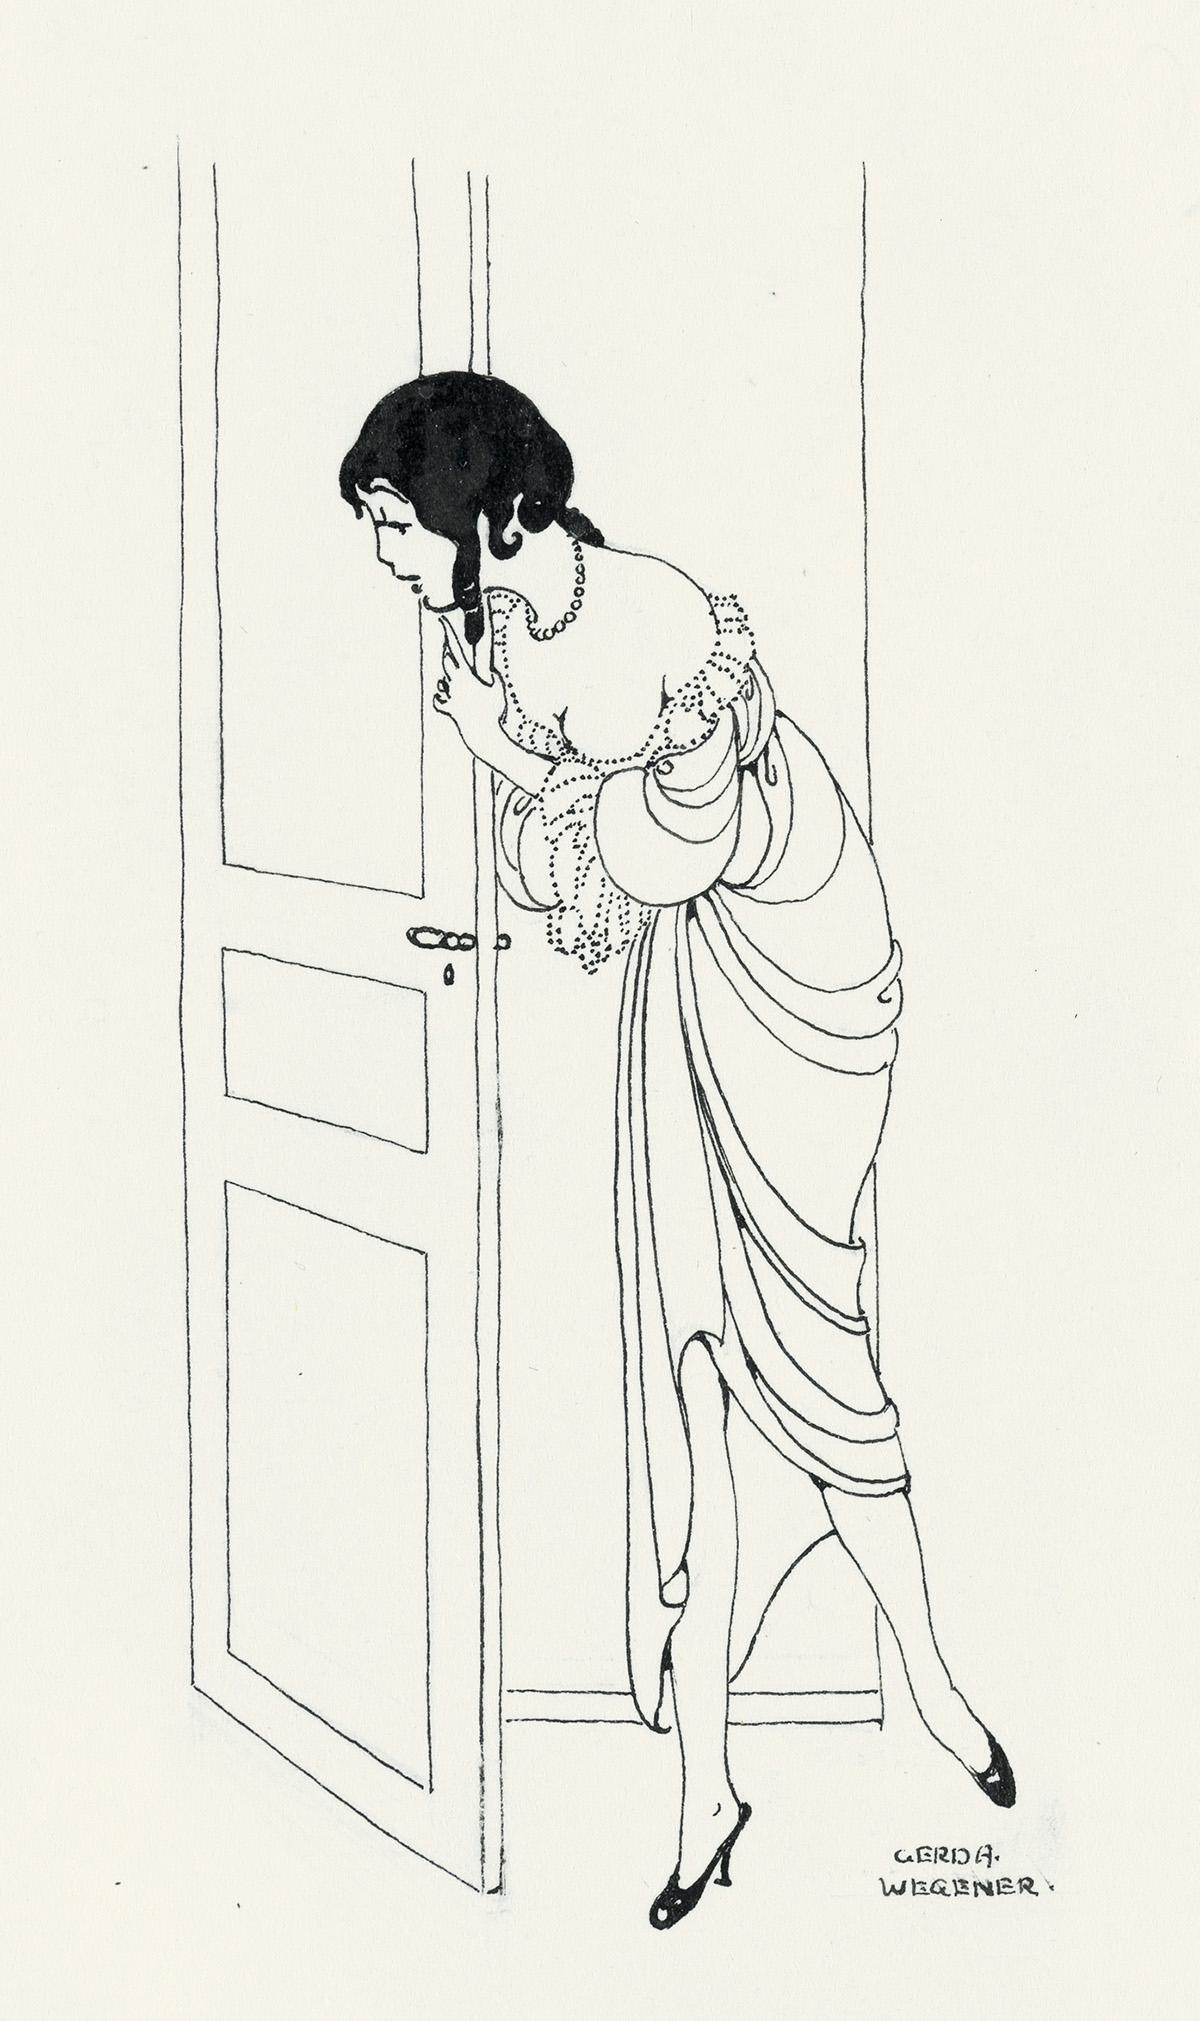 ADVERTISING FASHION GERDA WEGENER. Peeking around the door * Woman à la toilette.